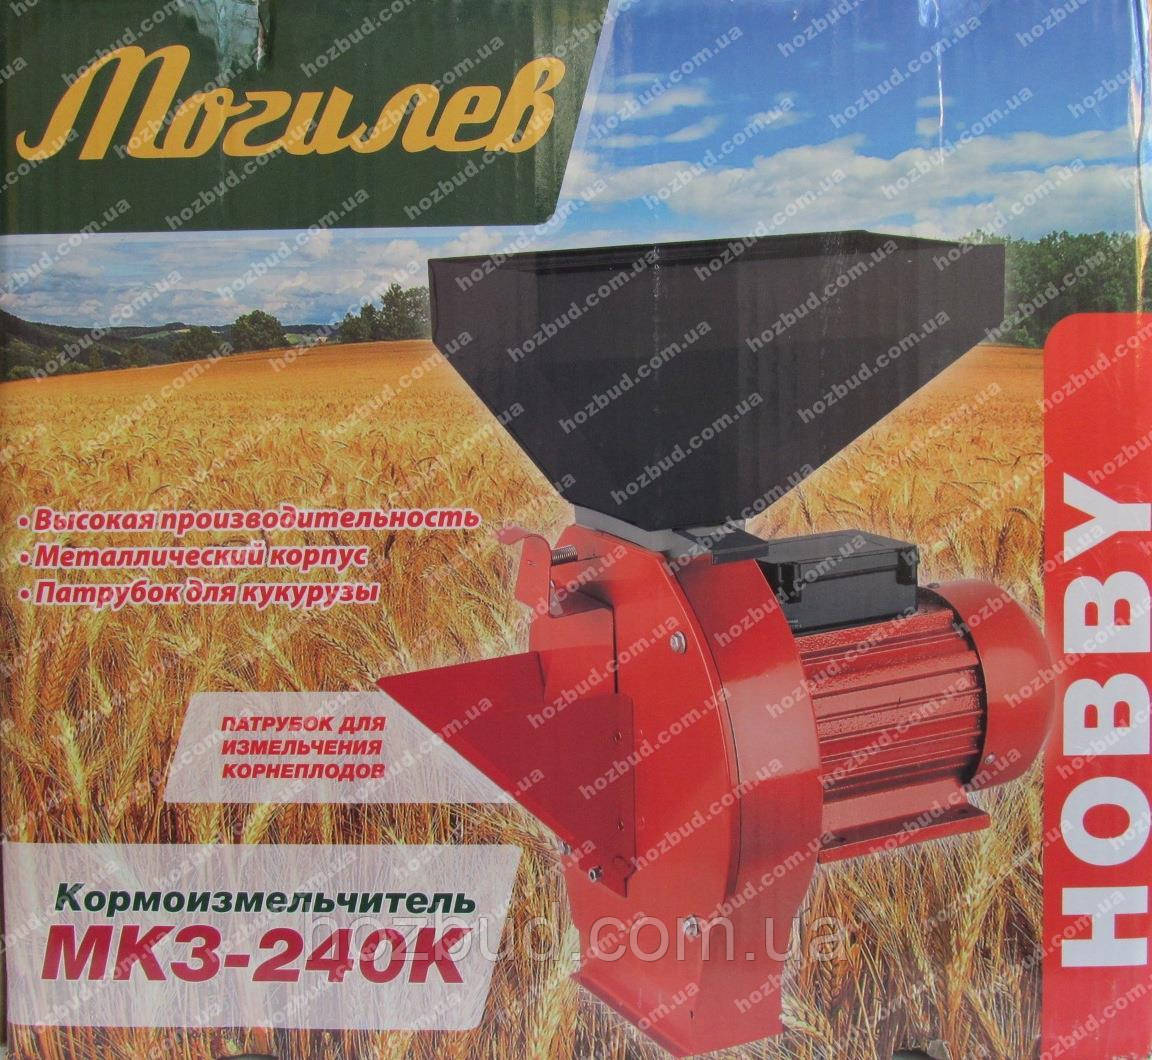 Кормоізмельчітель Могильов МКЗ-240К (зерно+коренеплоди)